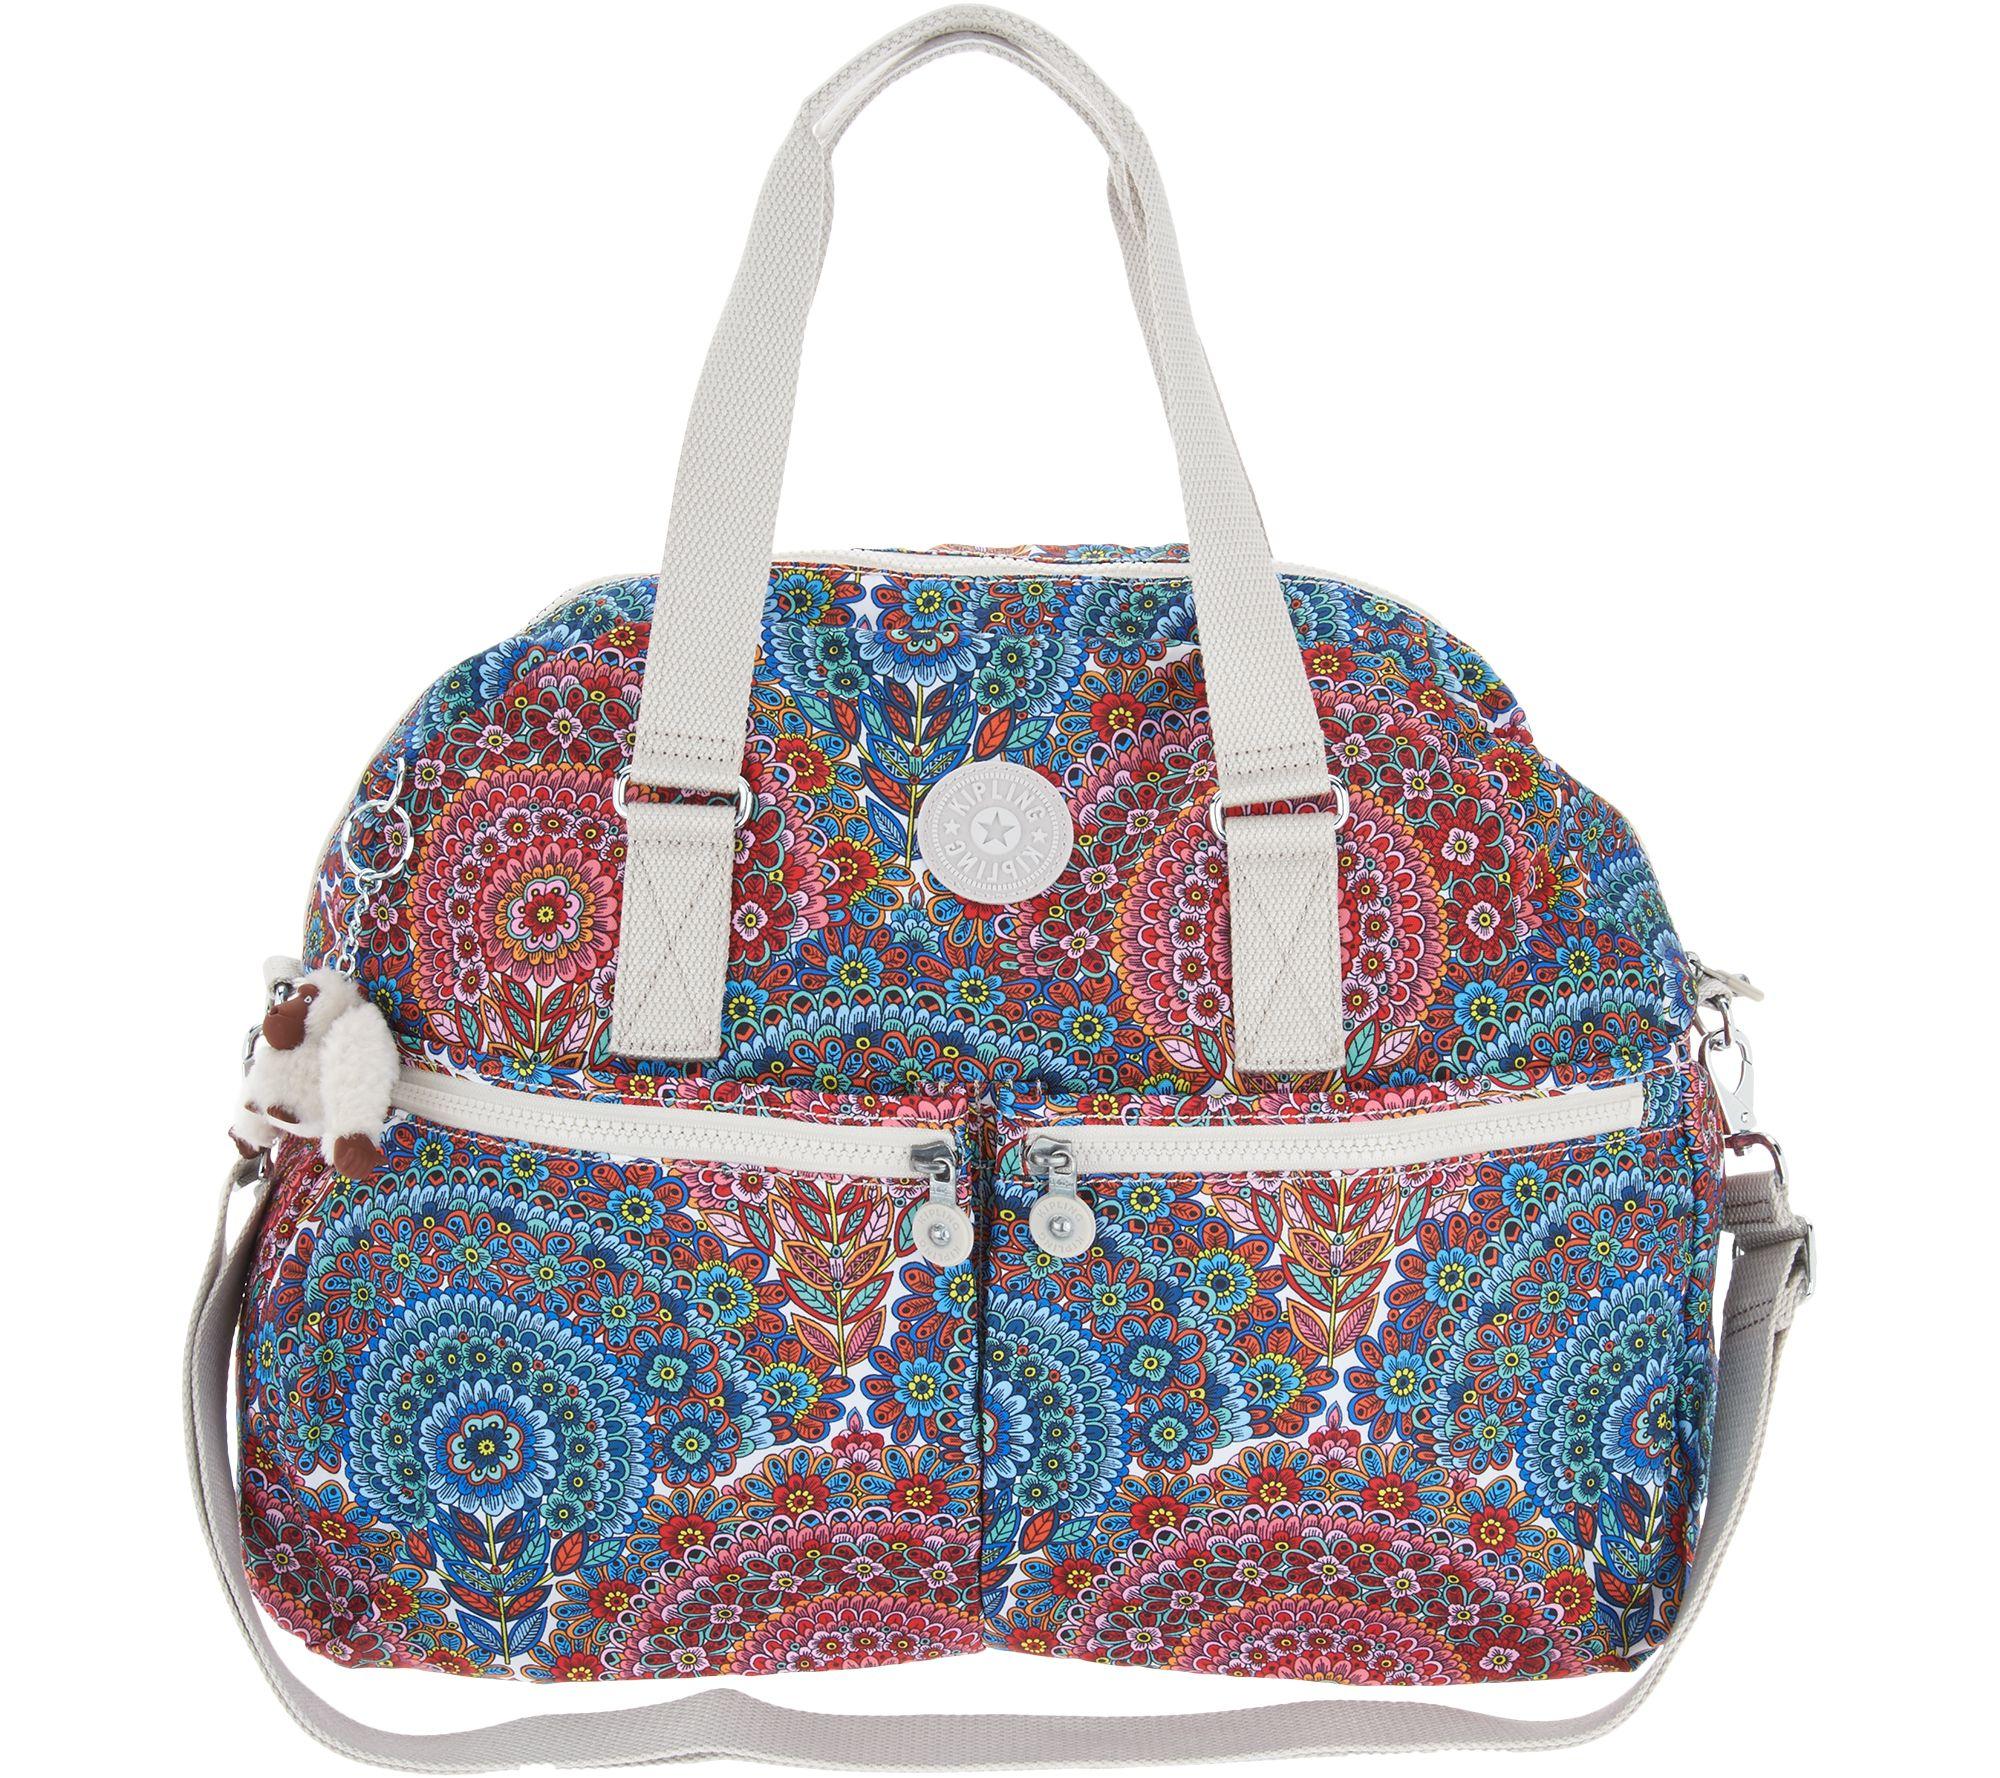 2671bae13287 Michael Kors Gia satchel features a Kipling Nylon Oversized Satchel -Eugina  - A299684 ...